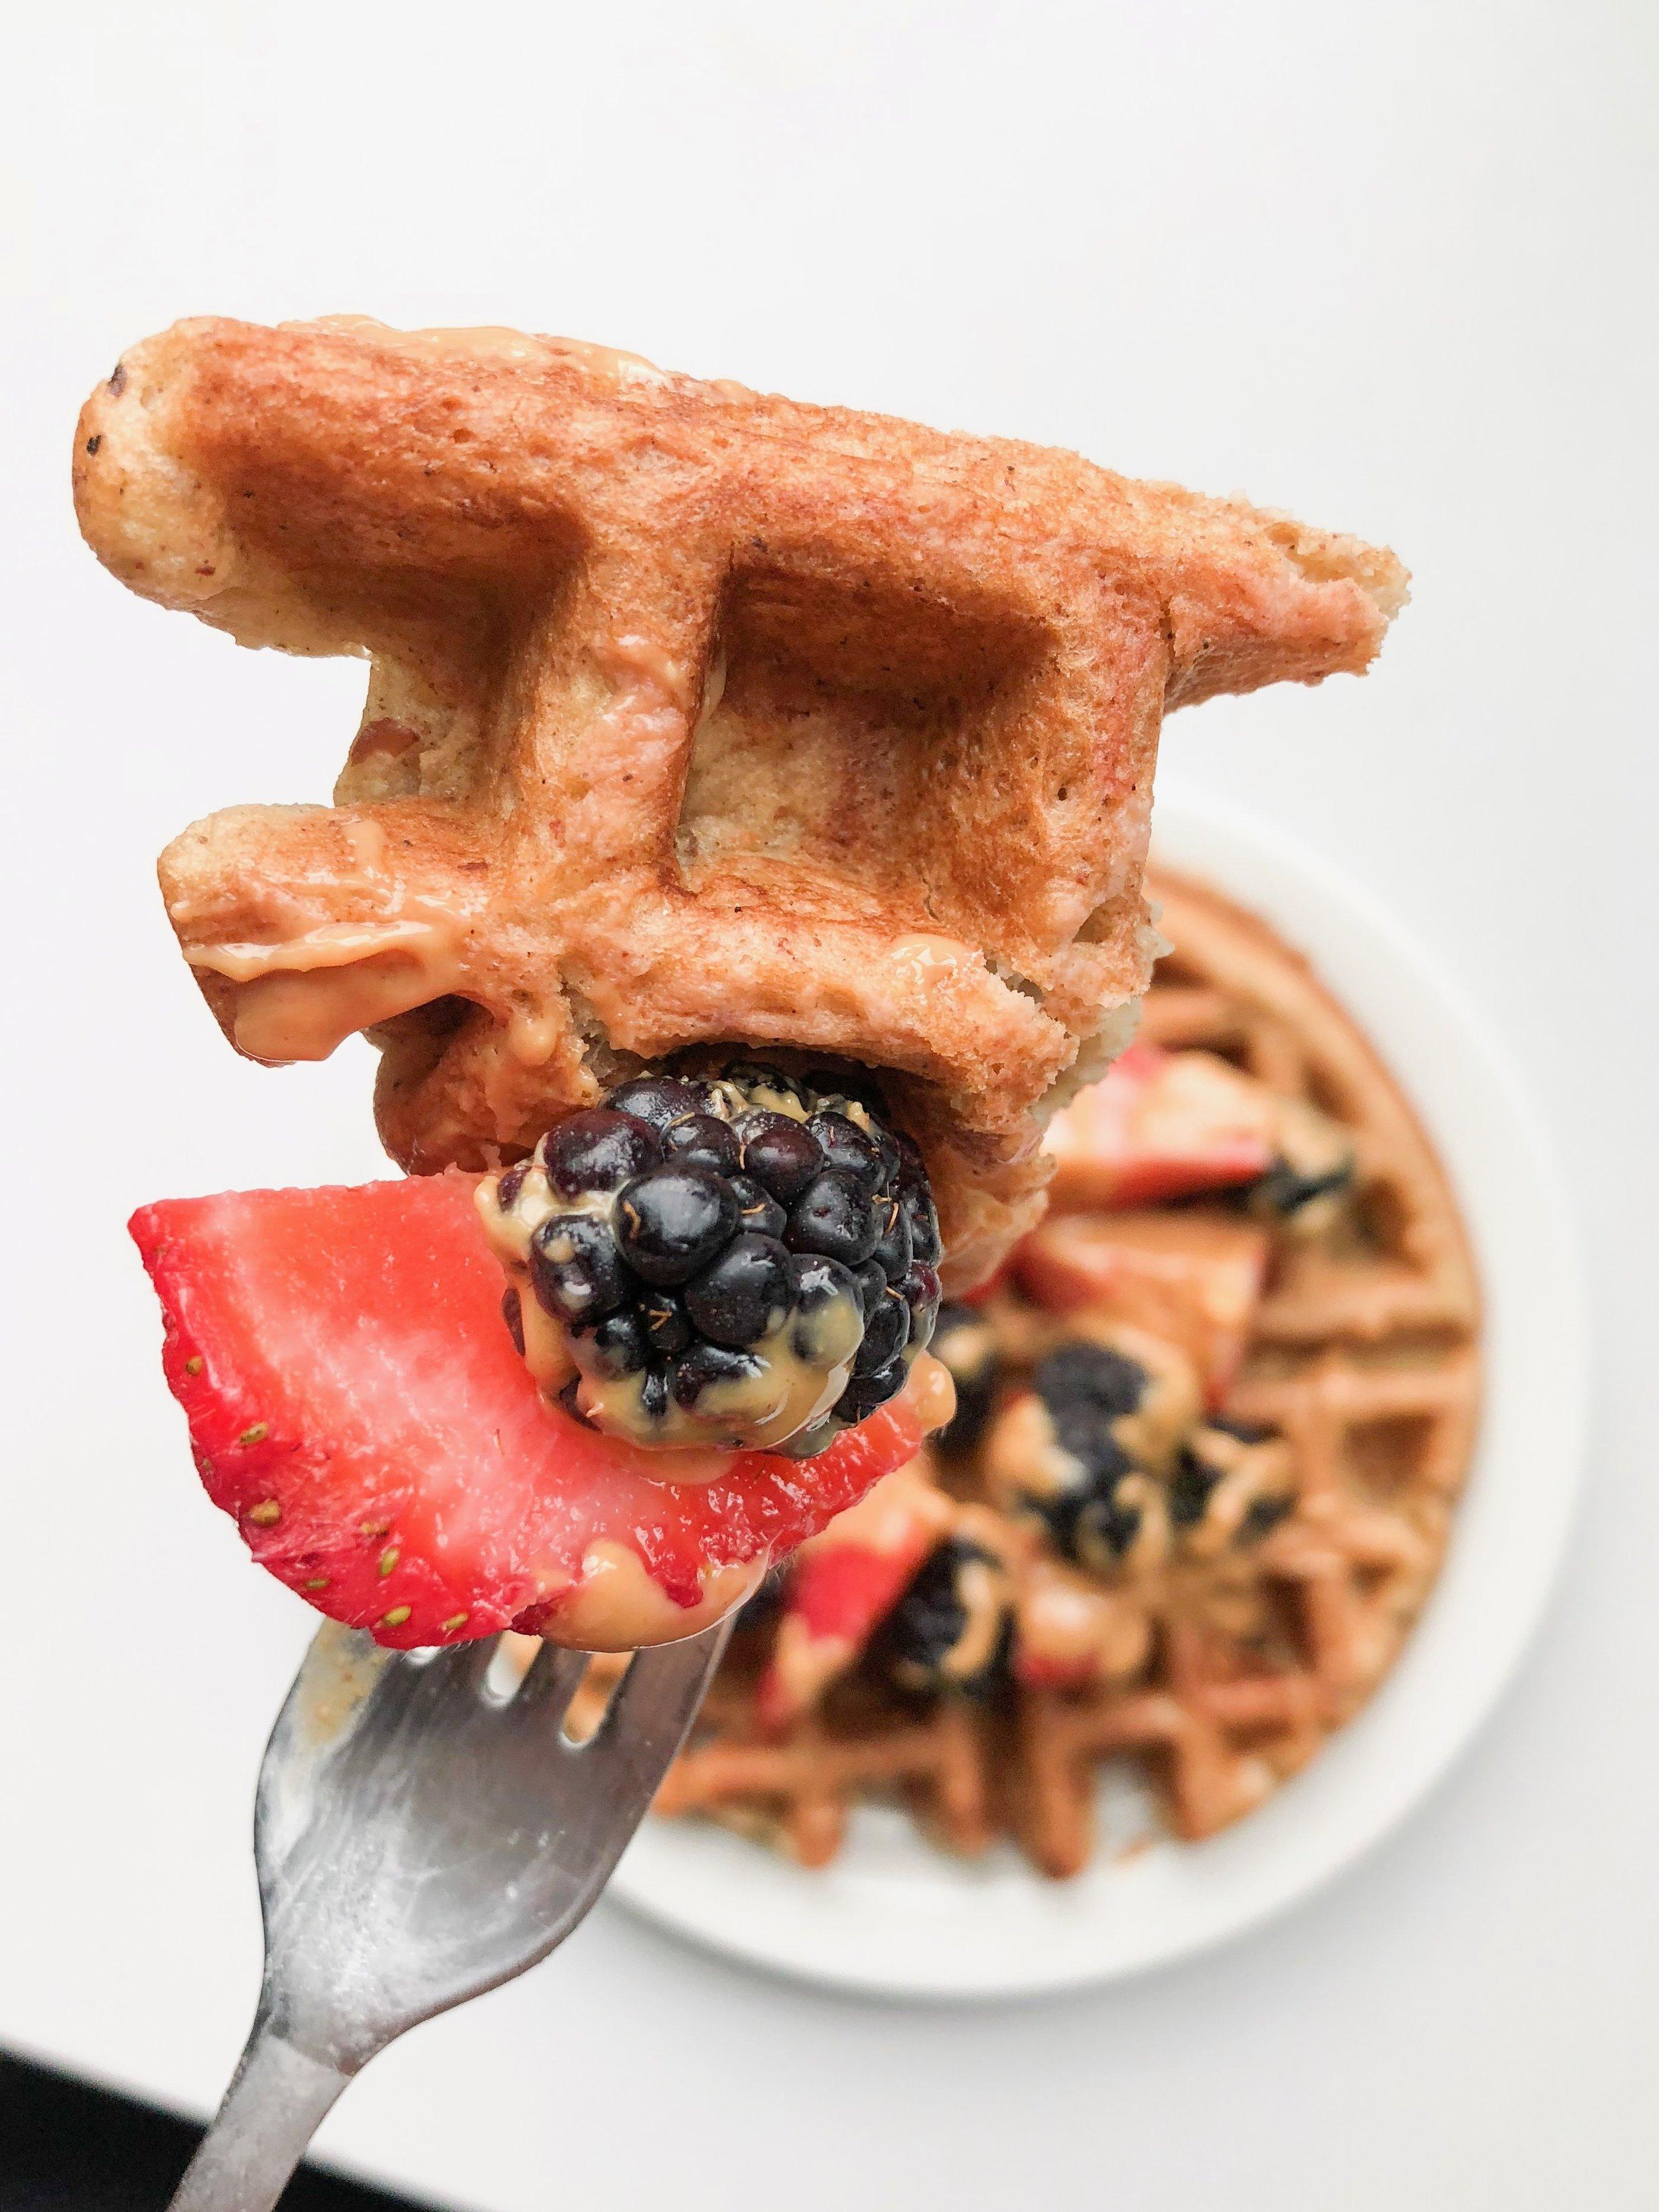 Gluten-Free Waffles - GLUTEN-FREE, DAIRY-FREE